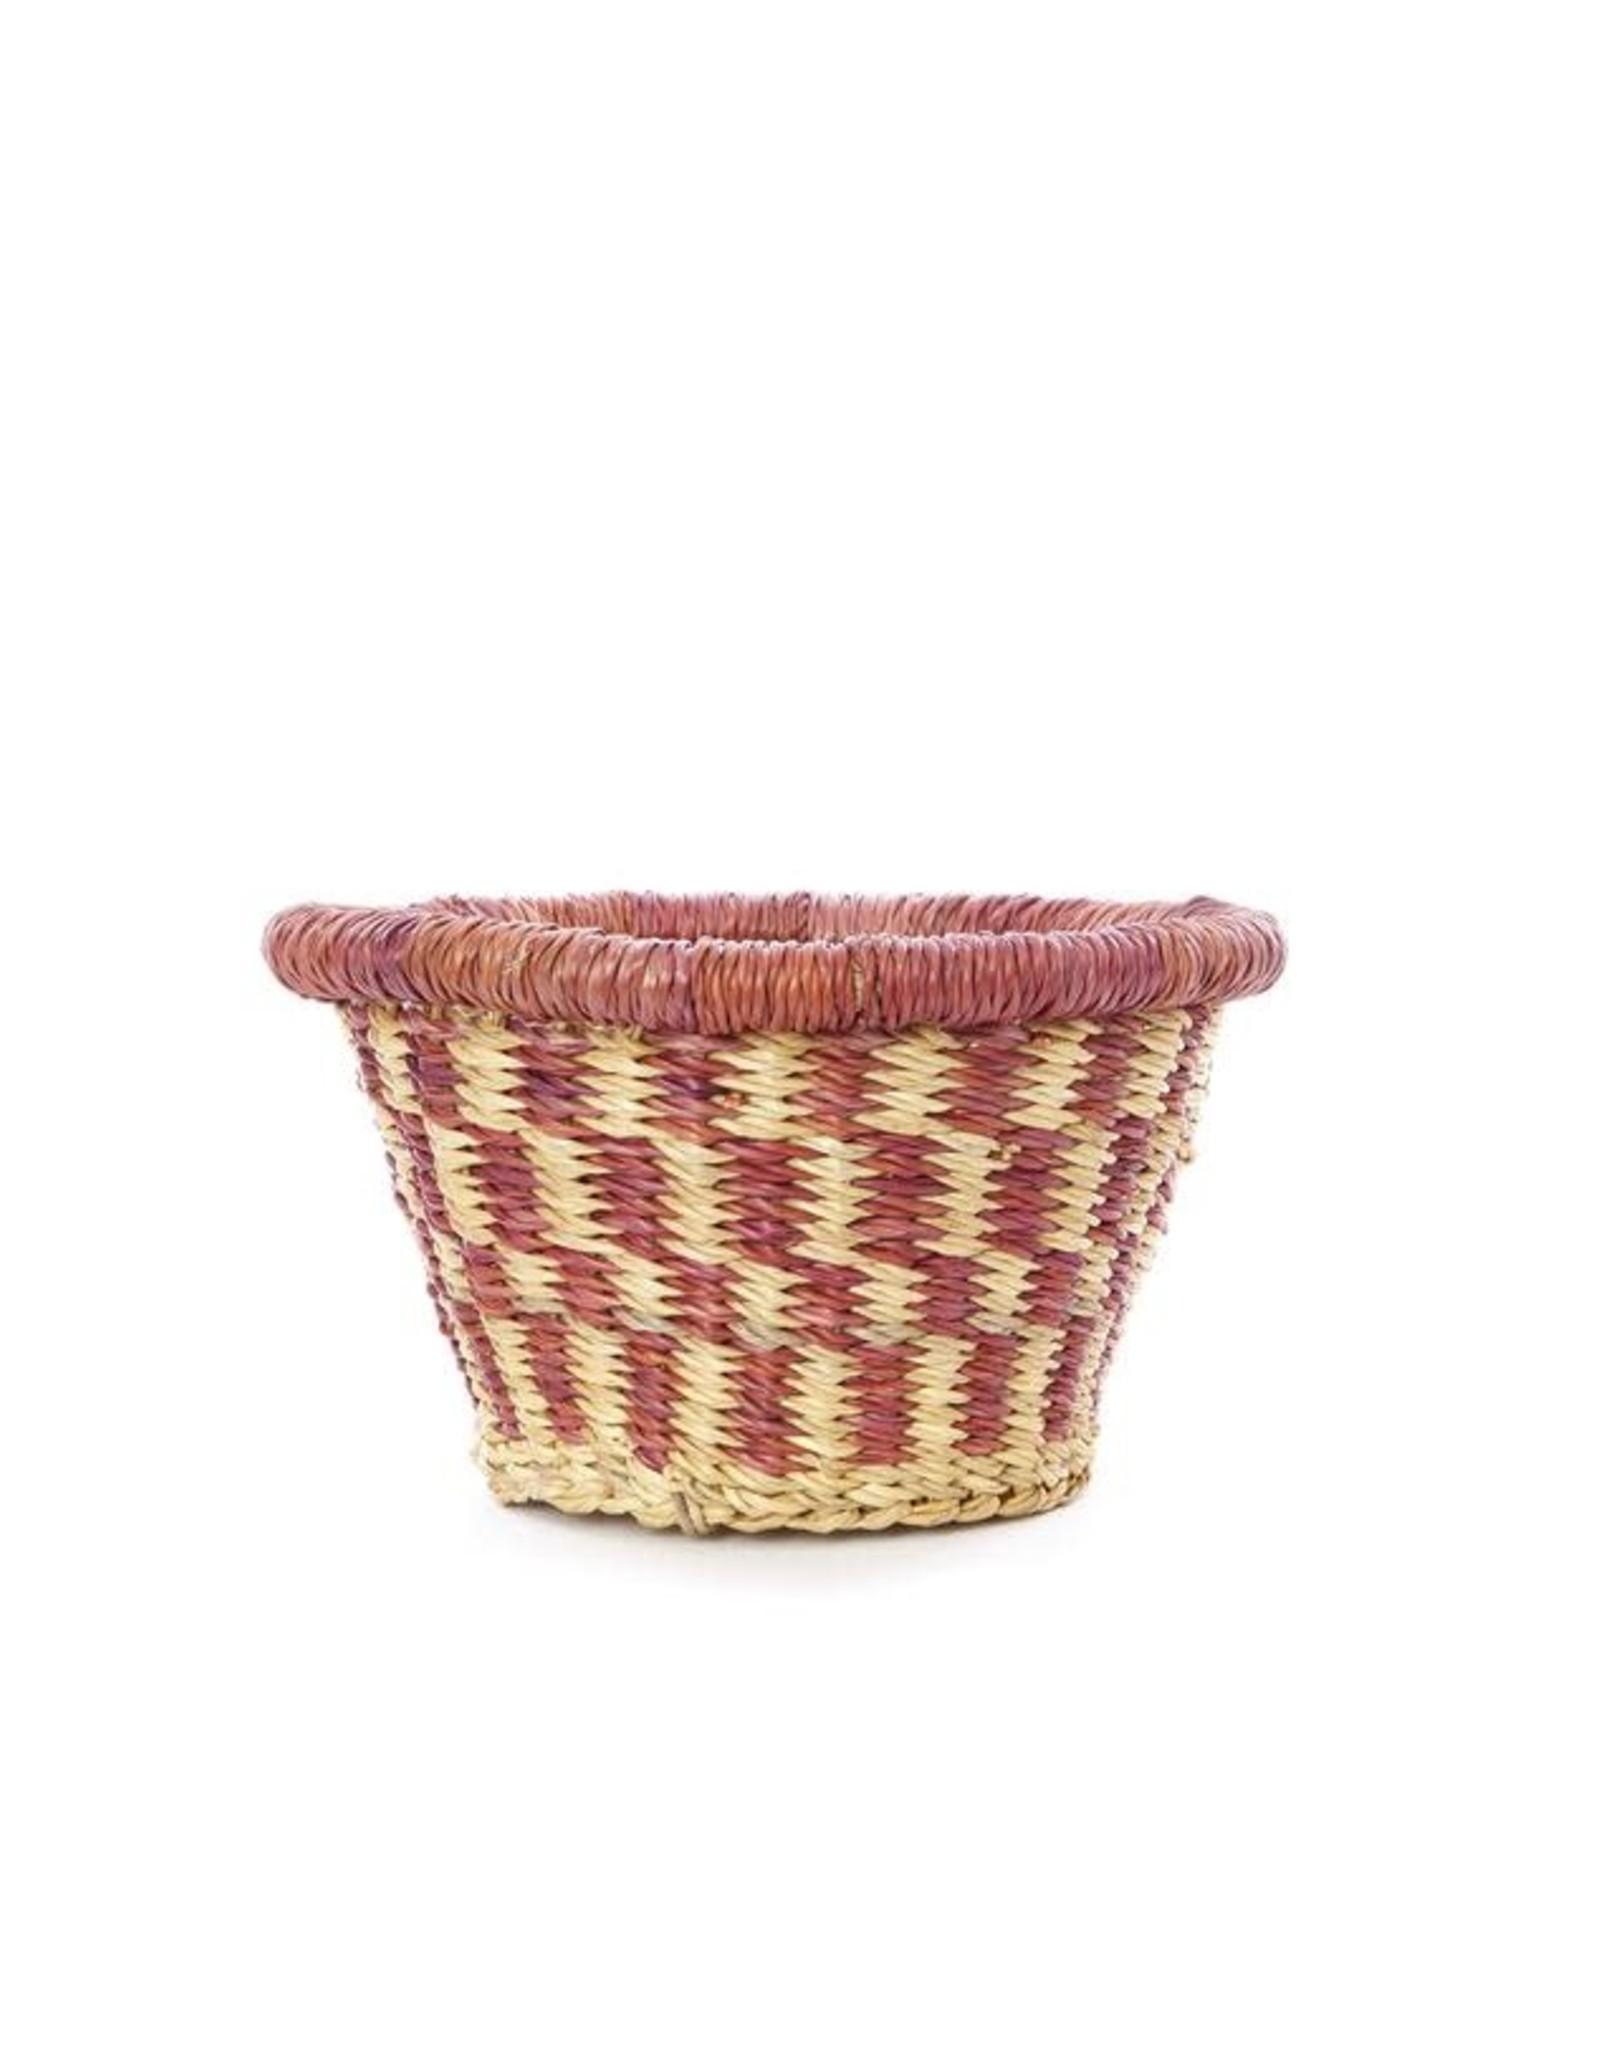 Swahili Wholesale Little Cupcake Baskets, Ghana